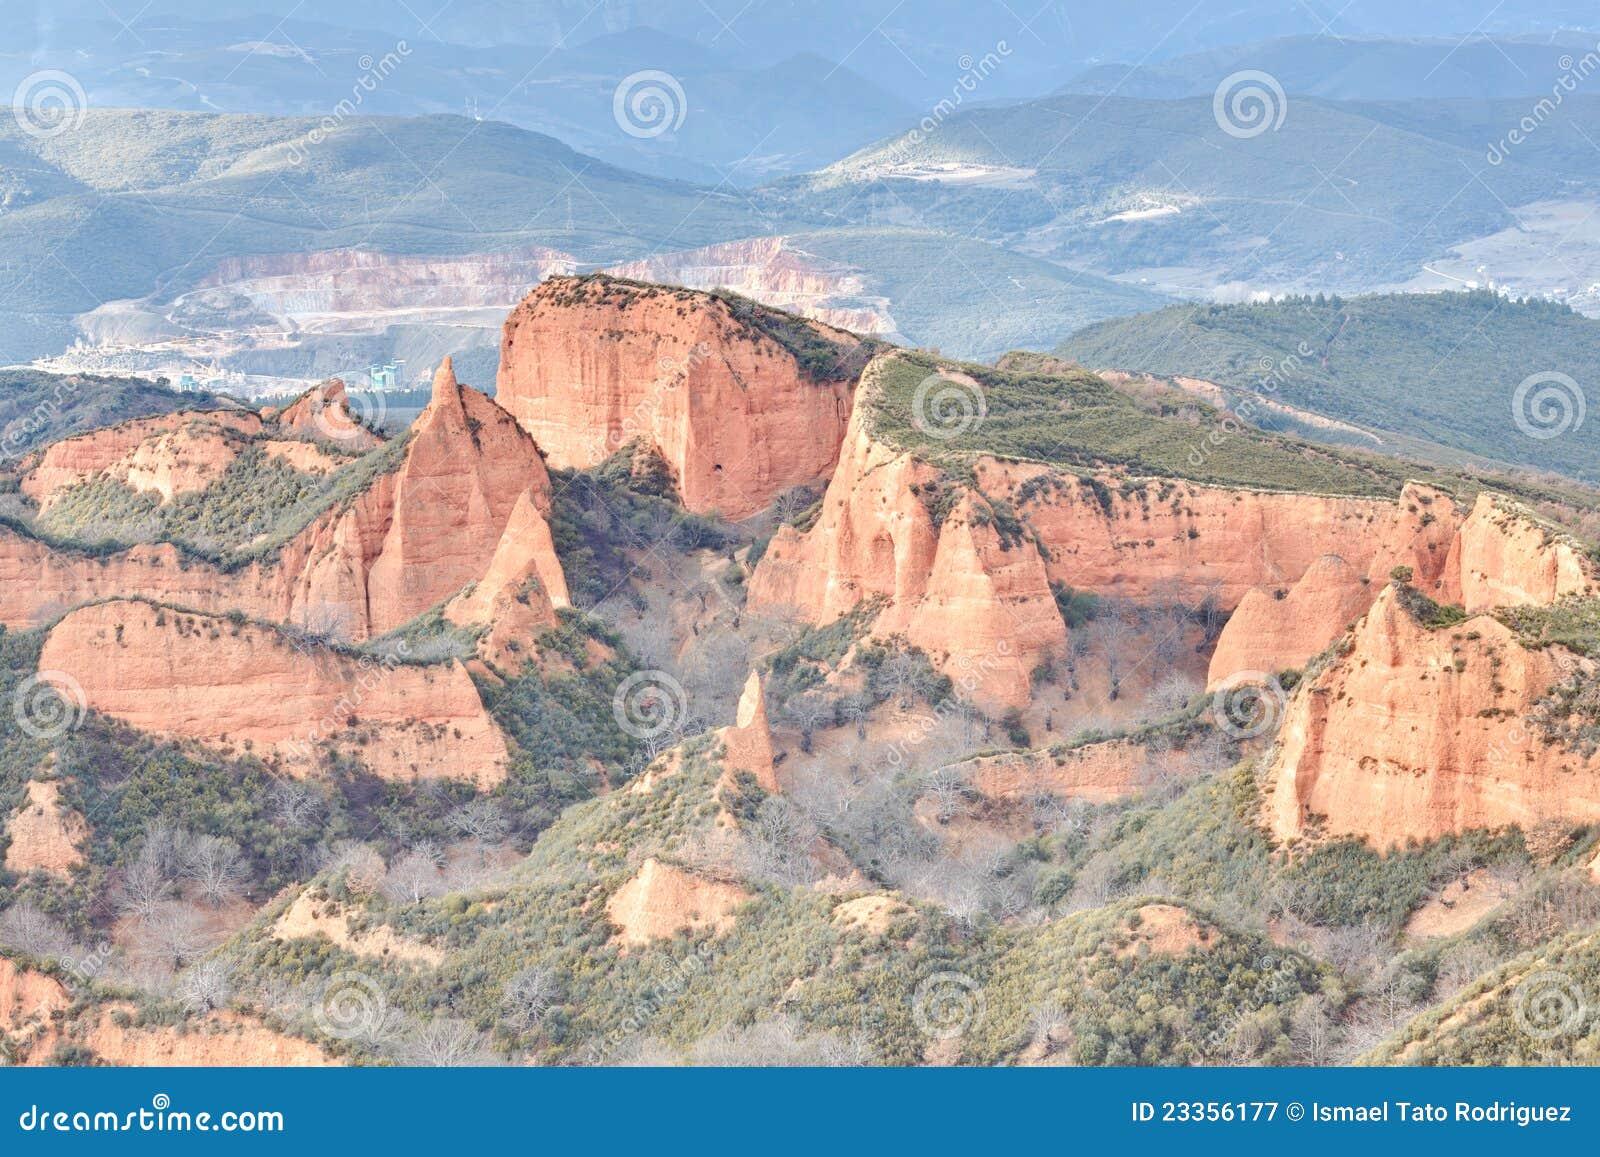 Las Medulas, Spain Royalty Free Stock Photography - Image: 23356177